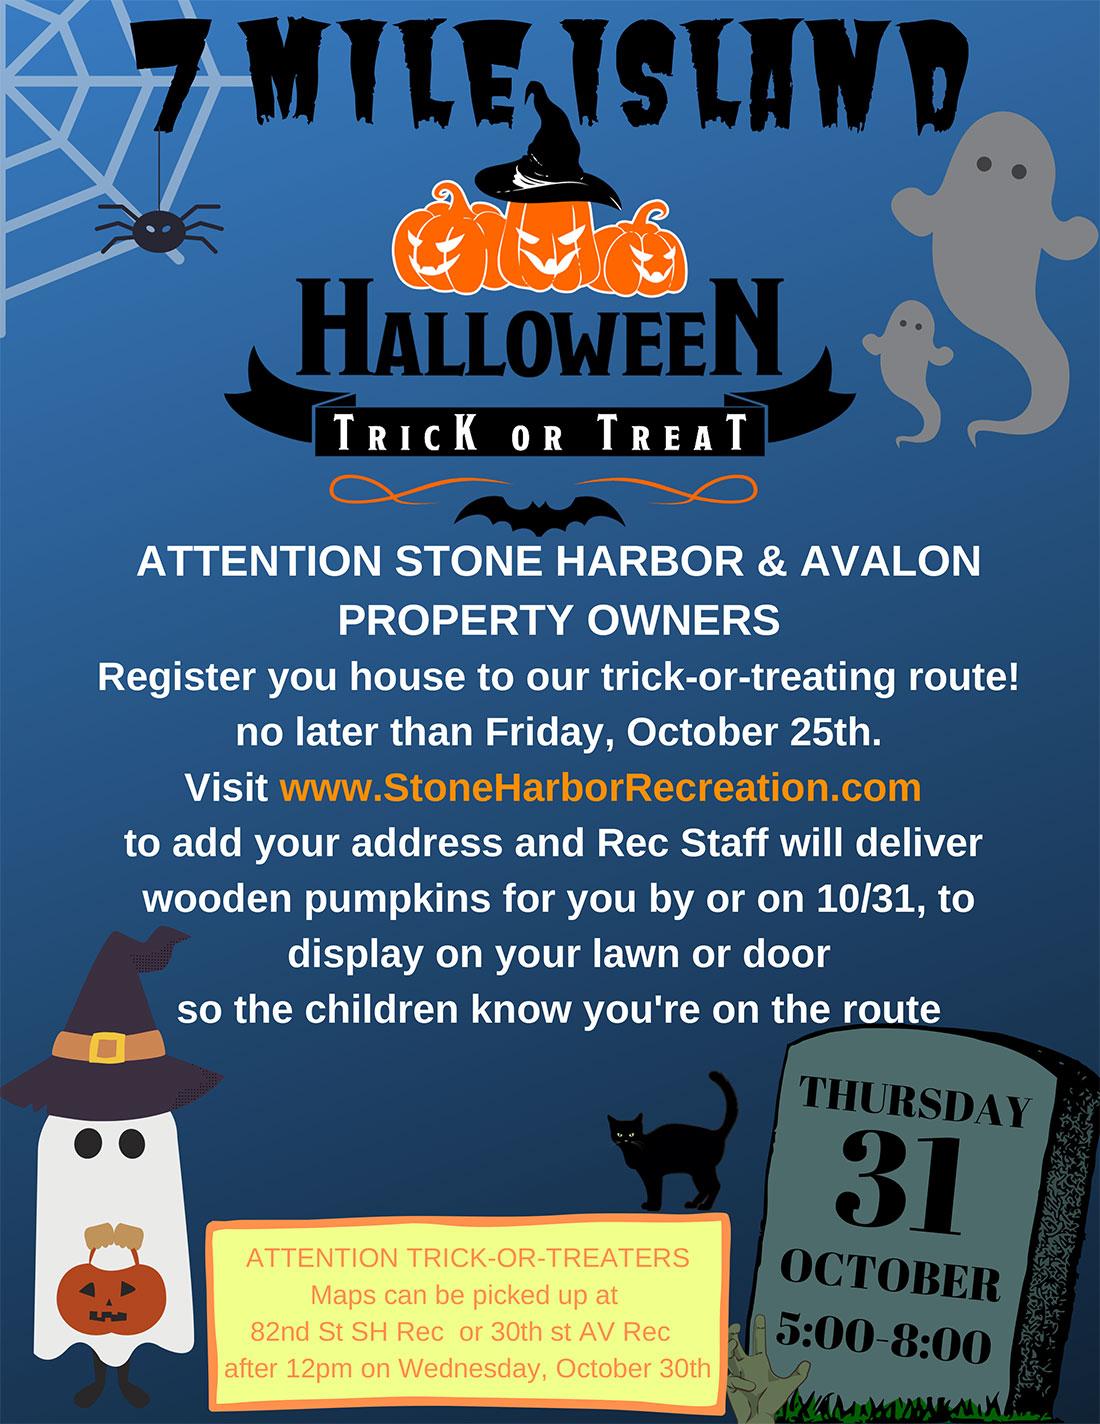 7 Mile Island Halloween House Registration